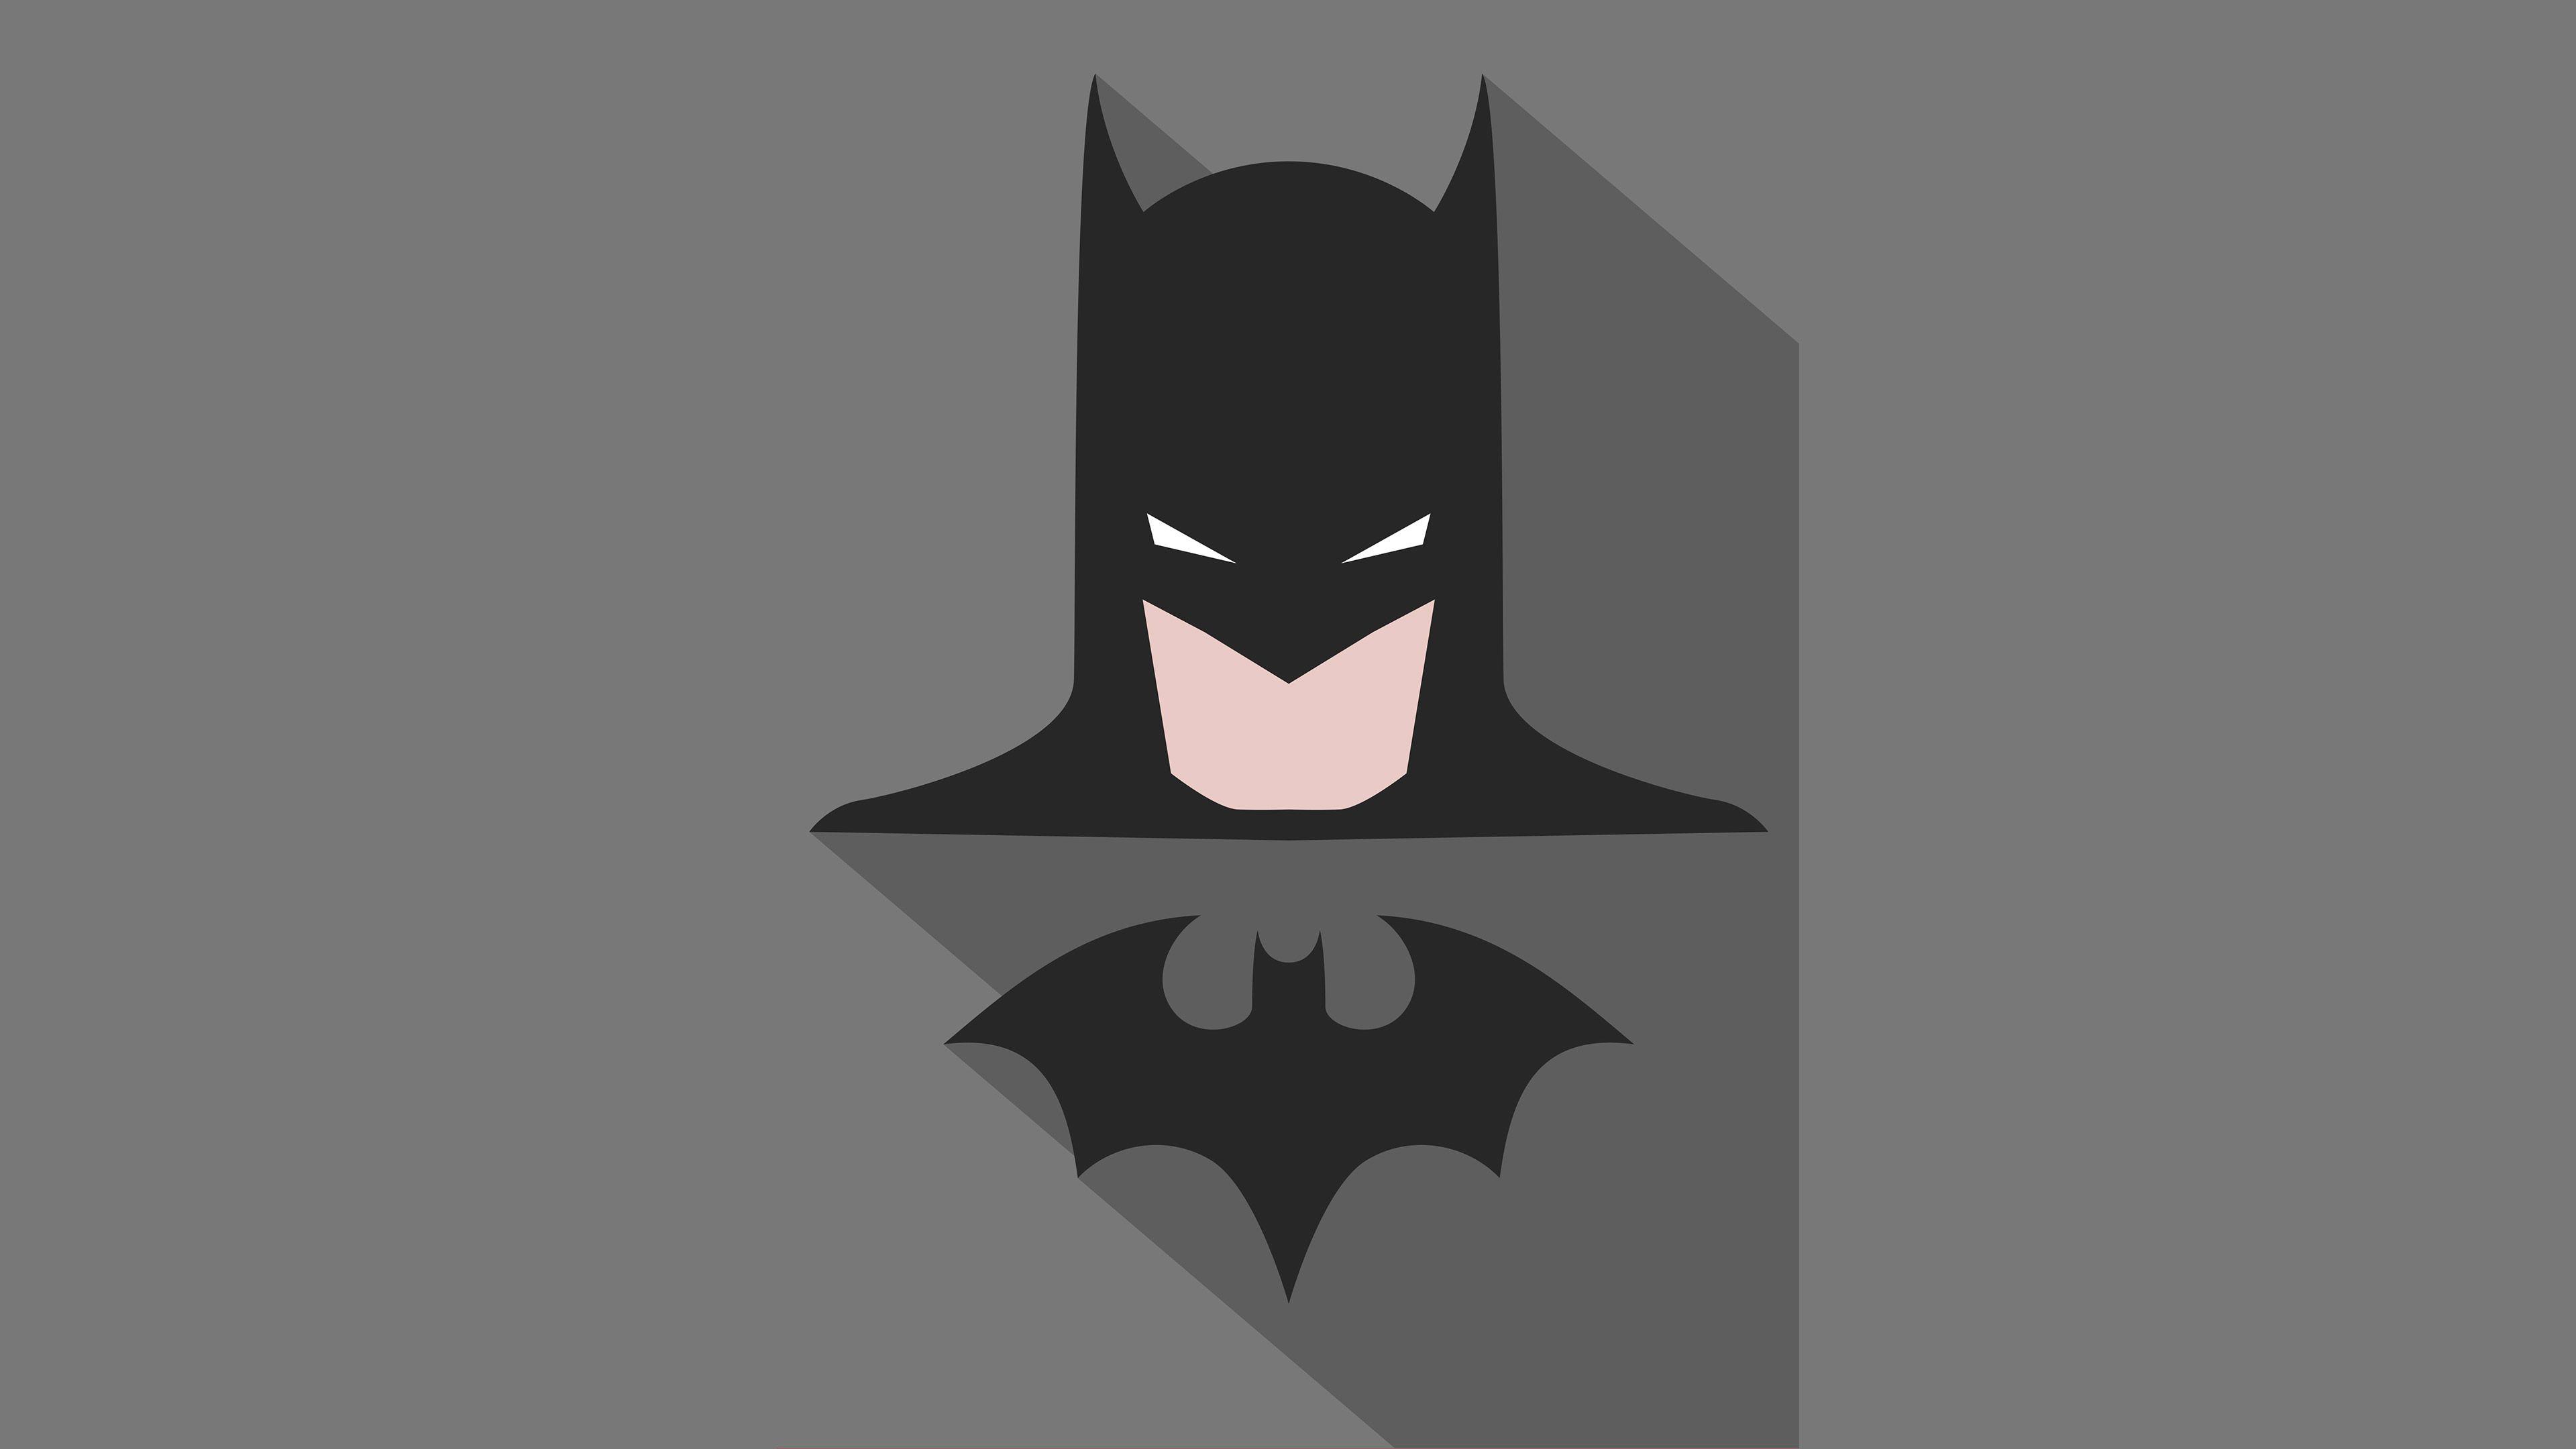 Batman Minimalism Poster Hd Superheroes 4k Wallpapers Images Superhero Wallpaper Hd Batman Wallpaper Minimalist Wallpaper